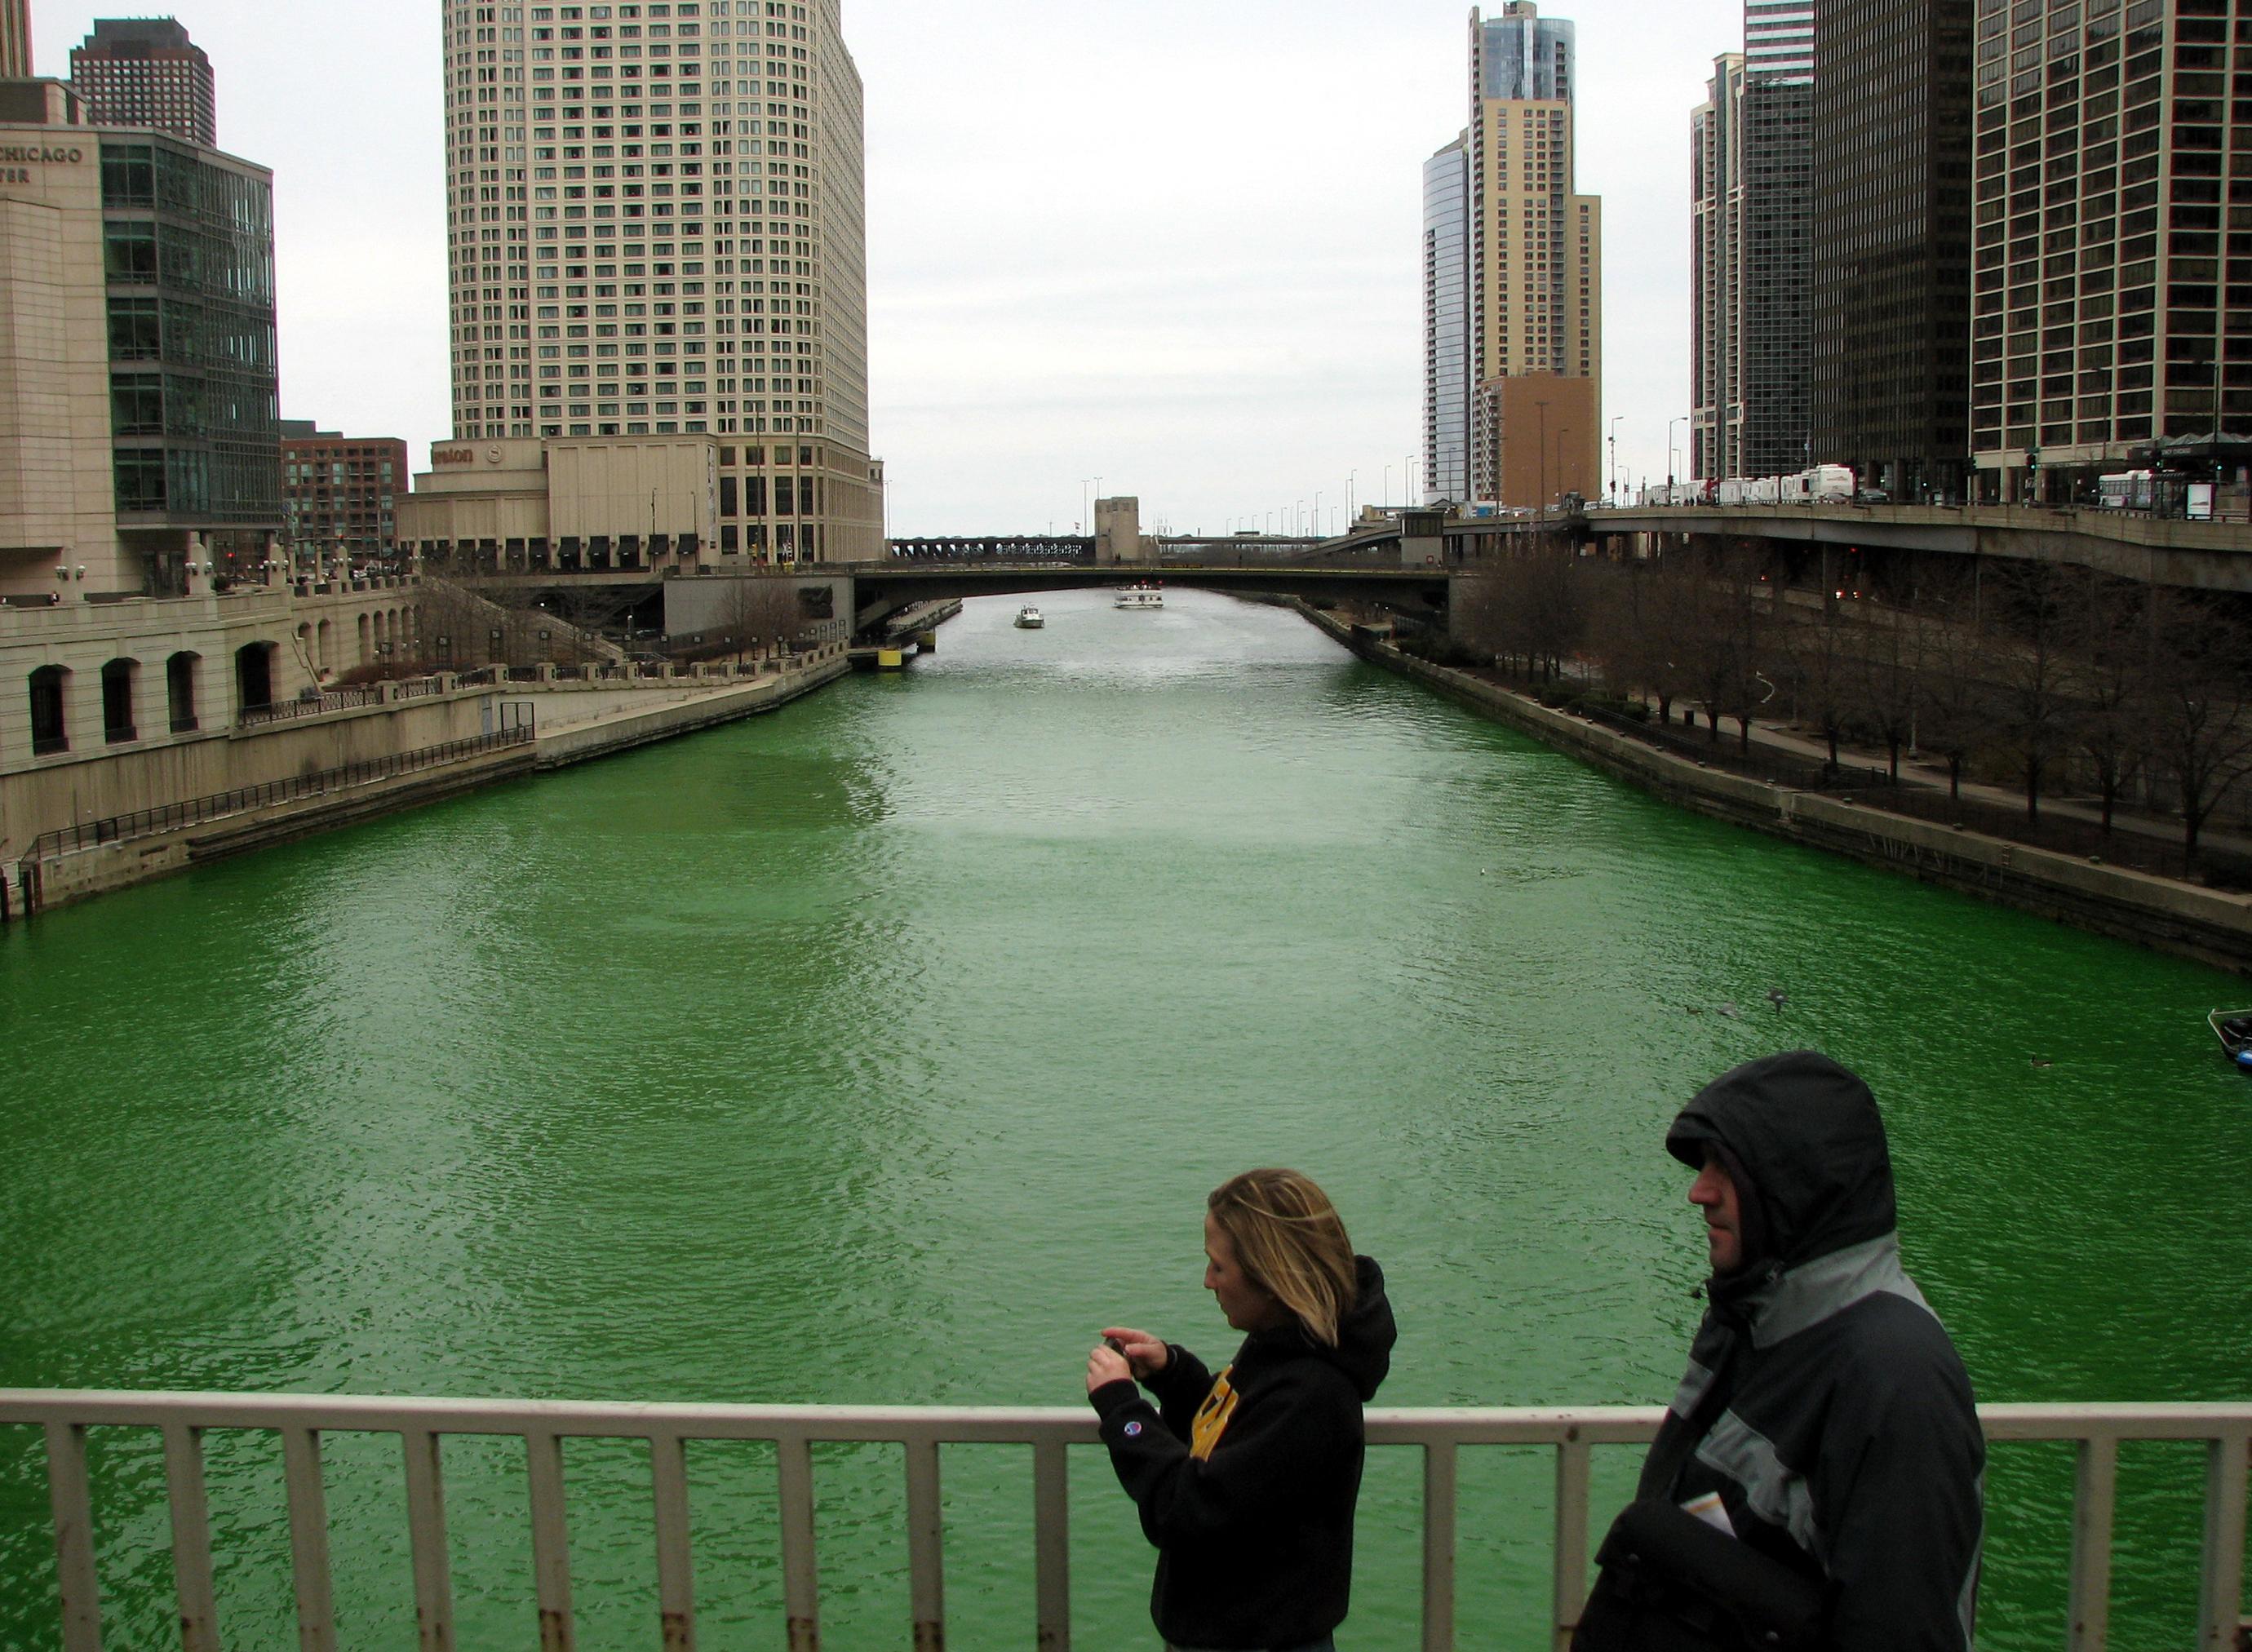 Chicago_River_St_Patricks_Day_08